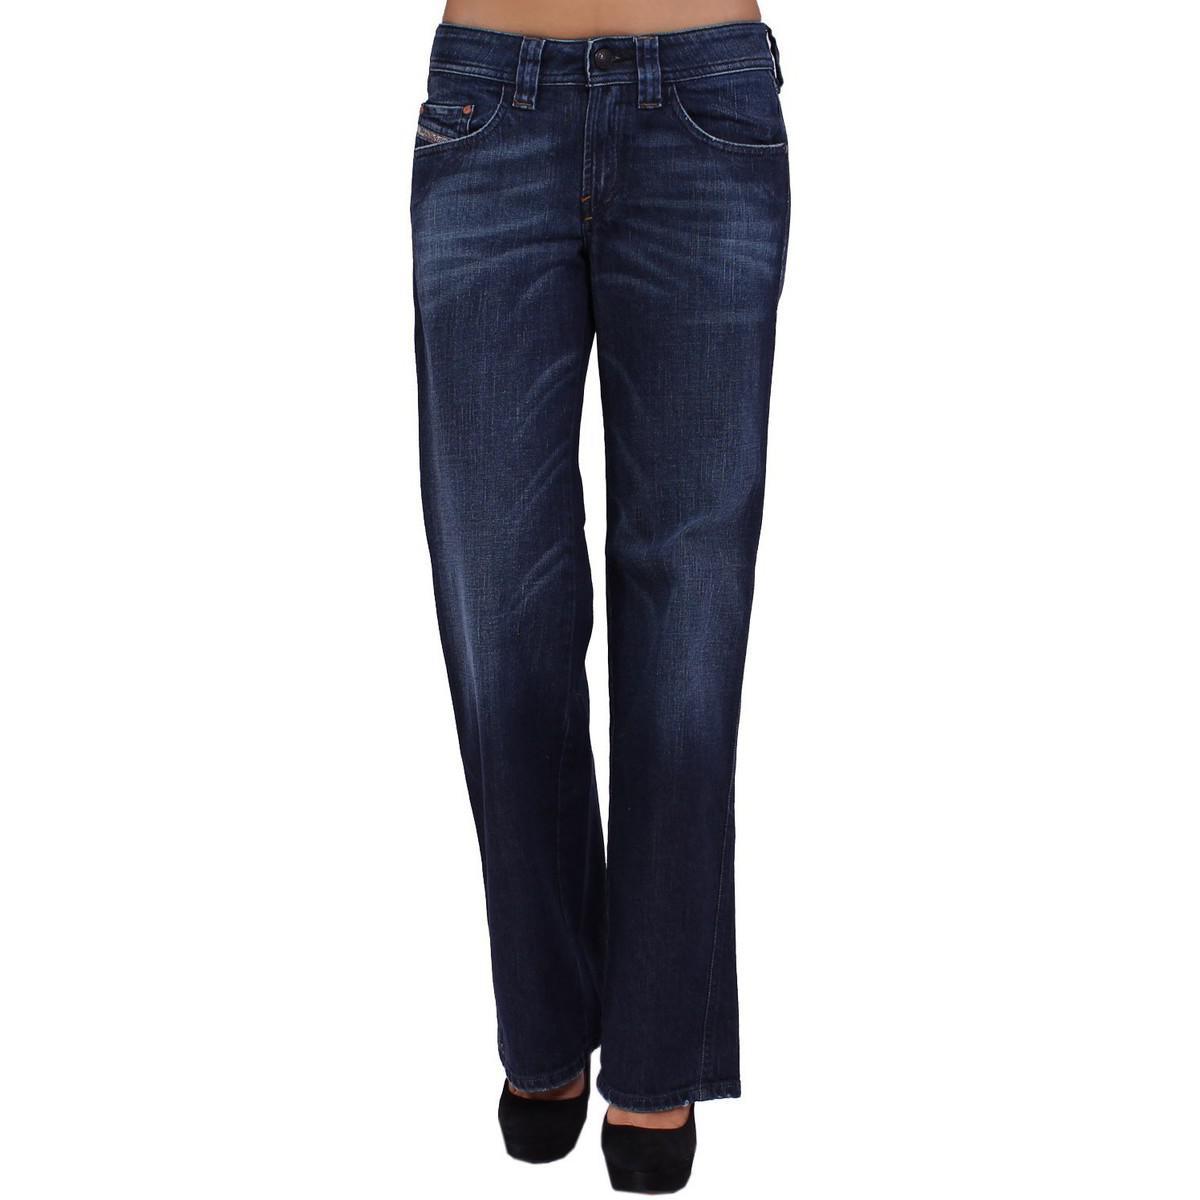 1c0e9efb DIESEL - Women's Jeans Vixta - Wash 8un - Stretch Women's Jeans In ...